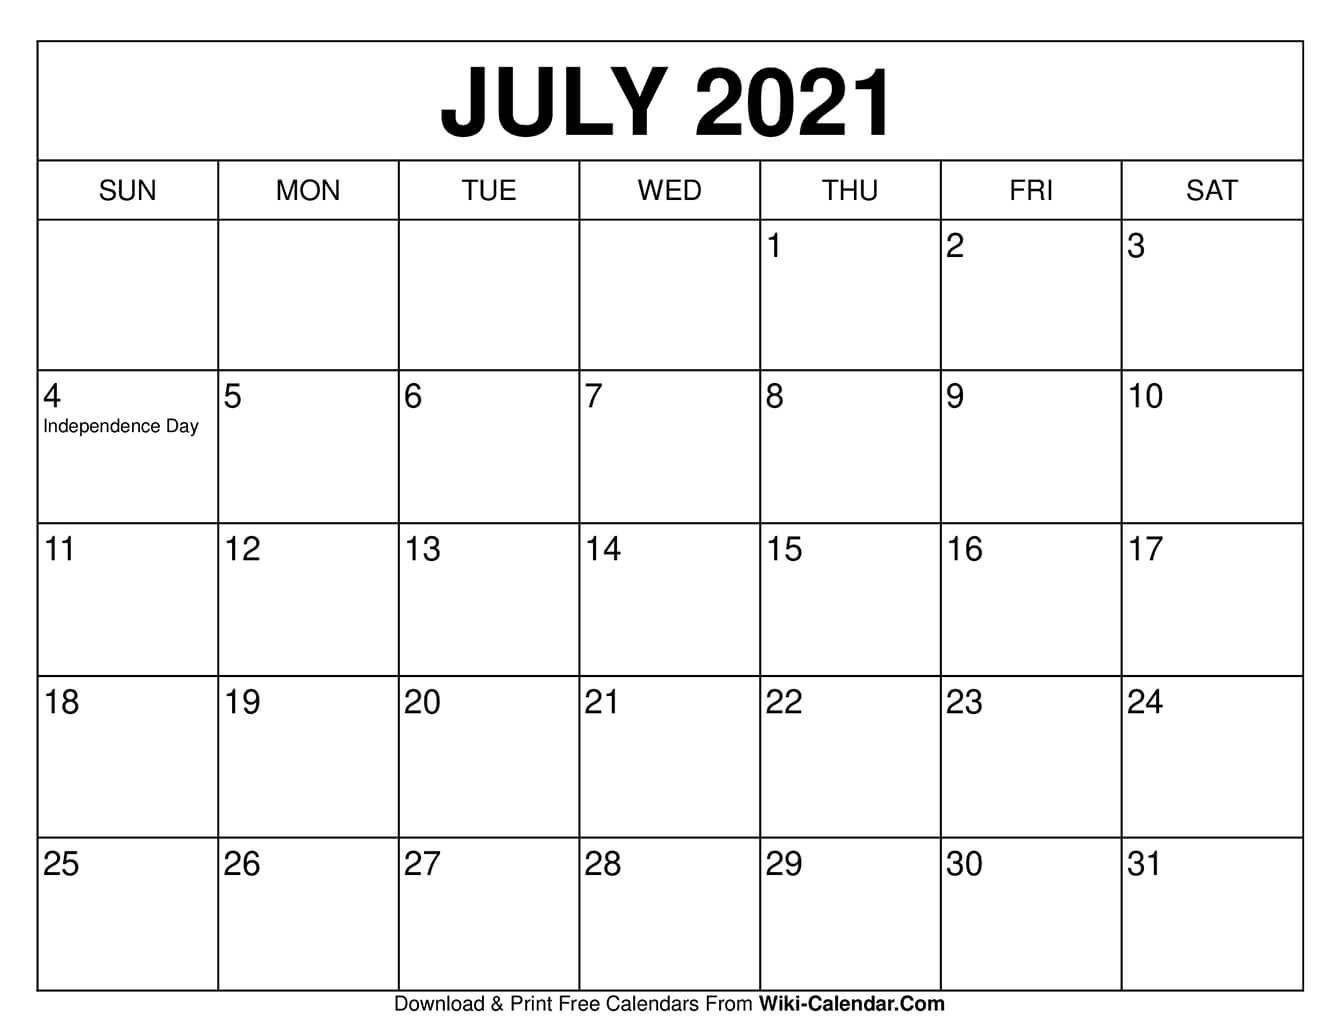 July 2021 Calendar In 2020 | Free Calendars To Print, Free